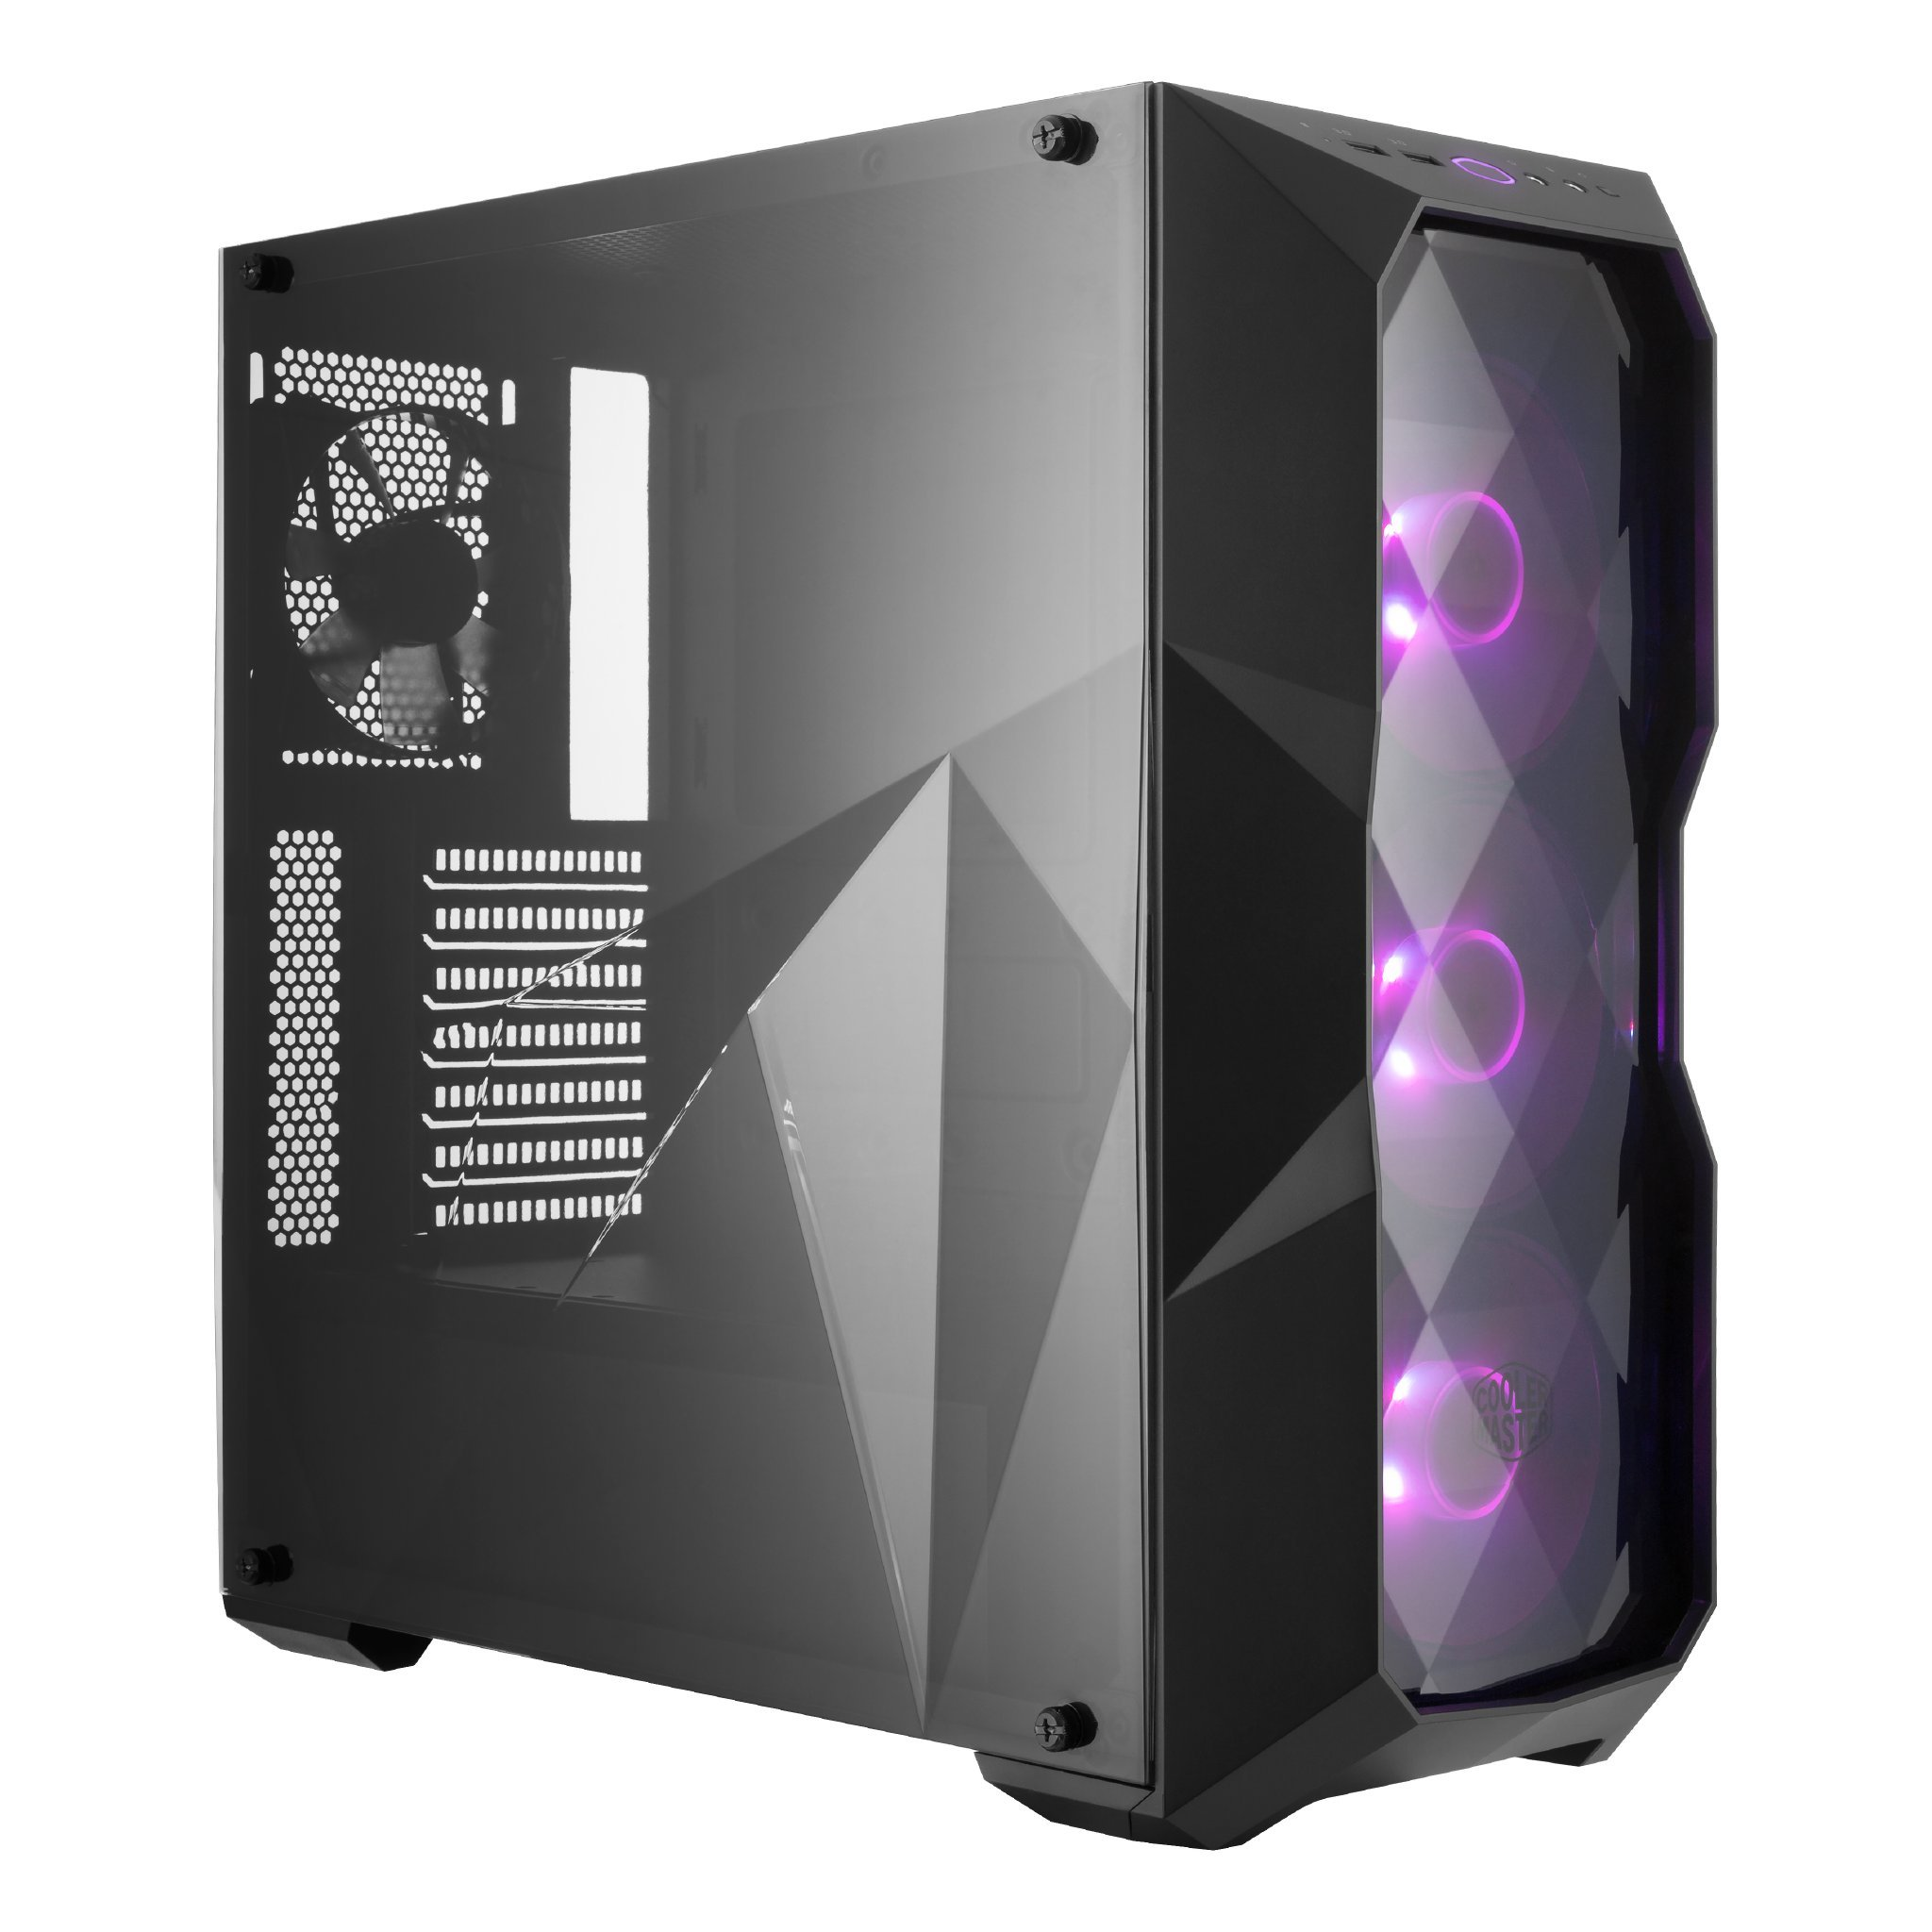 Cooler Master MasterBox TD500 RGB Cases (MCB-D500D-KANN-S00)